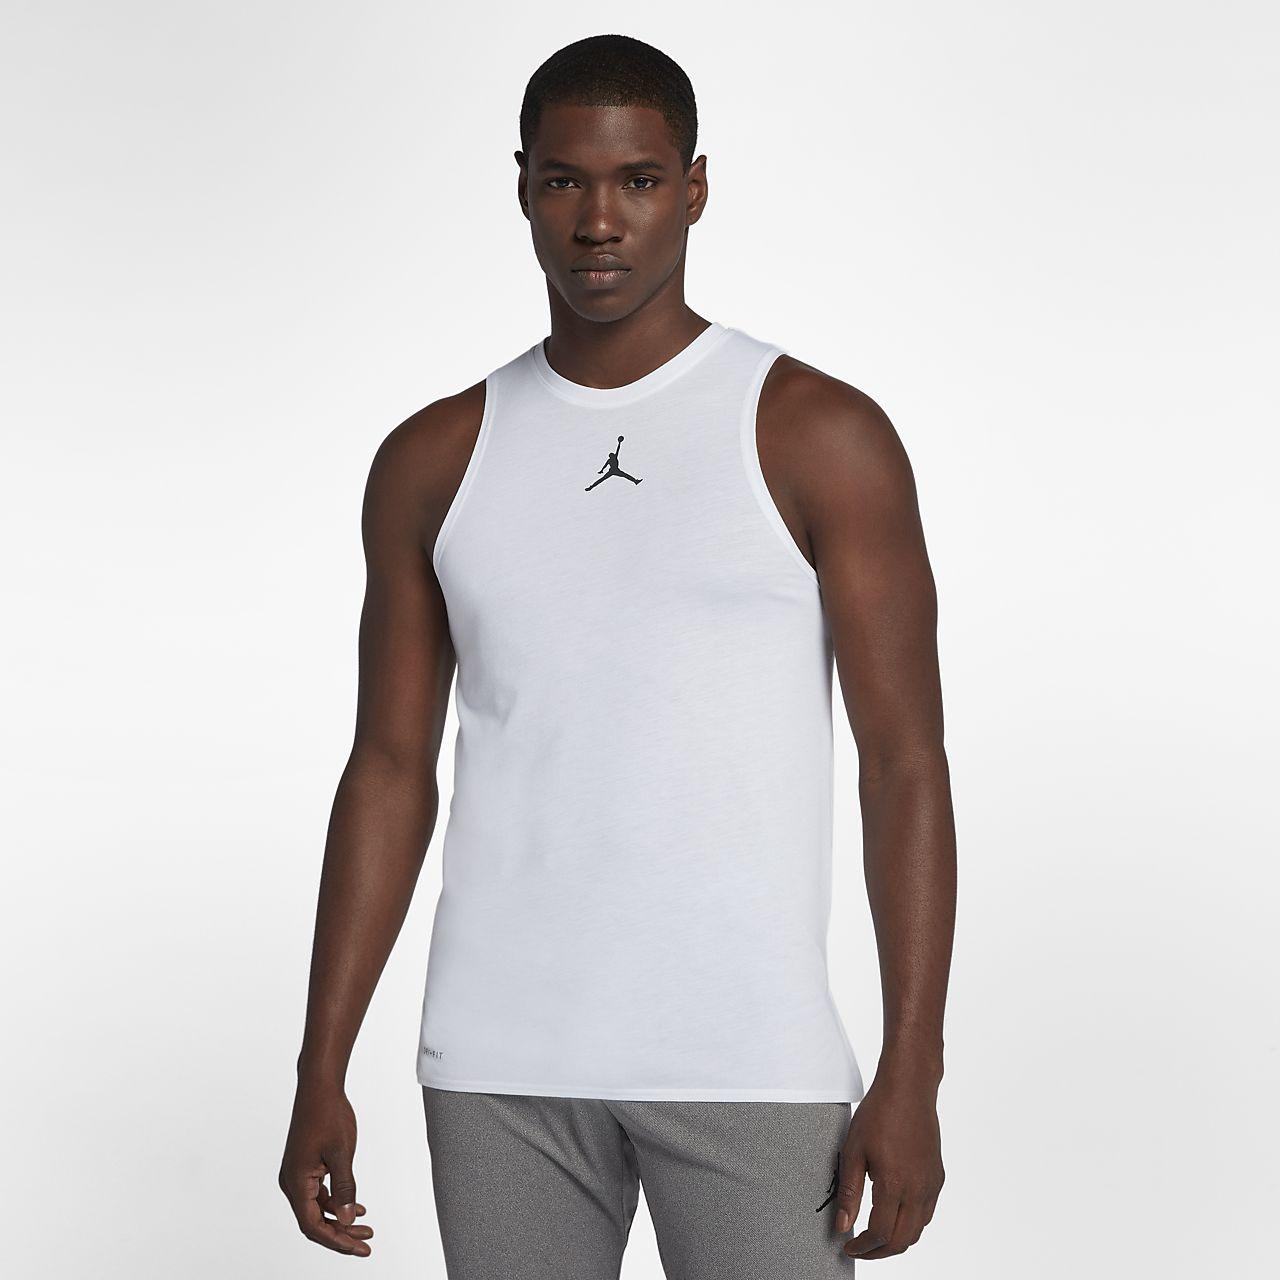 ff7ebf615dd36f Jordan 23 Alpha Men s Sleeveless Training Top. Nike.com DK